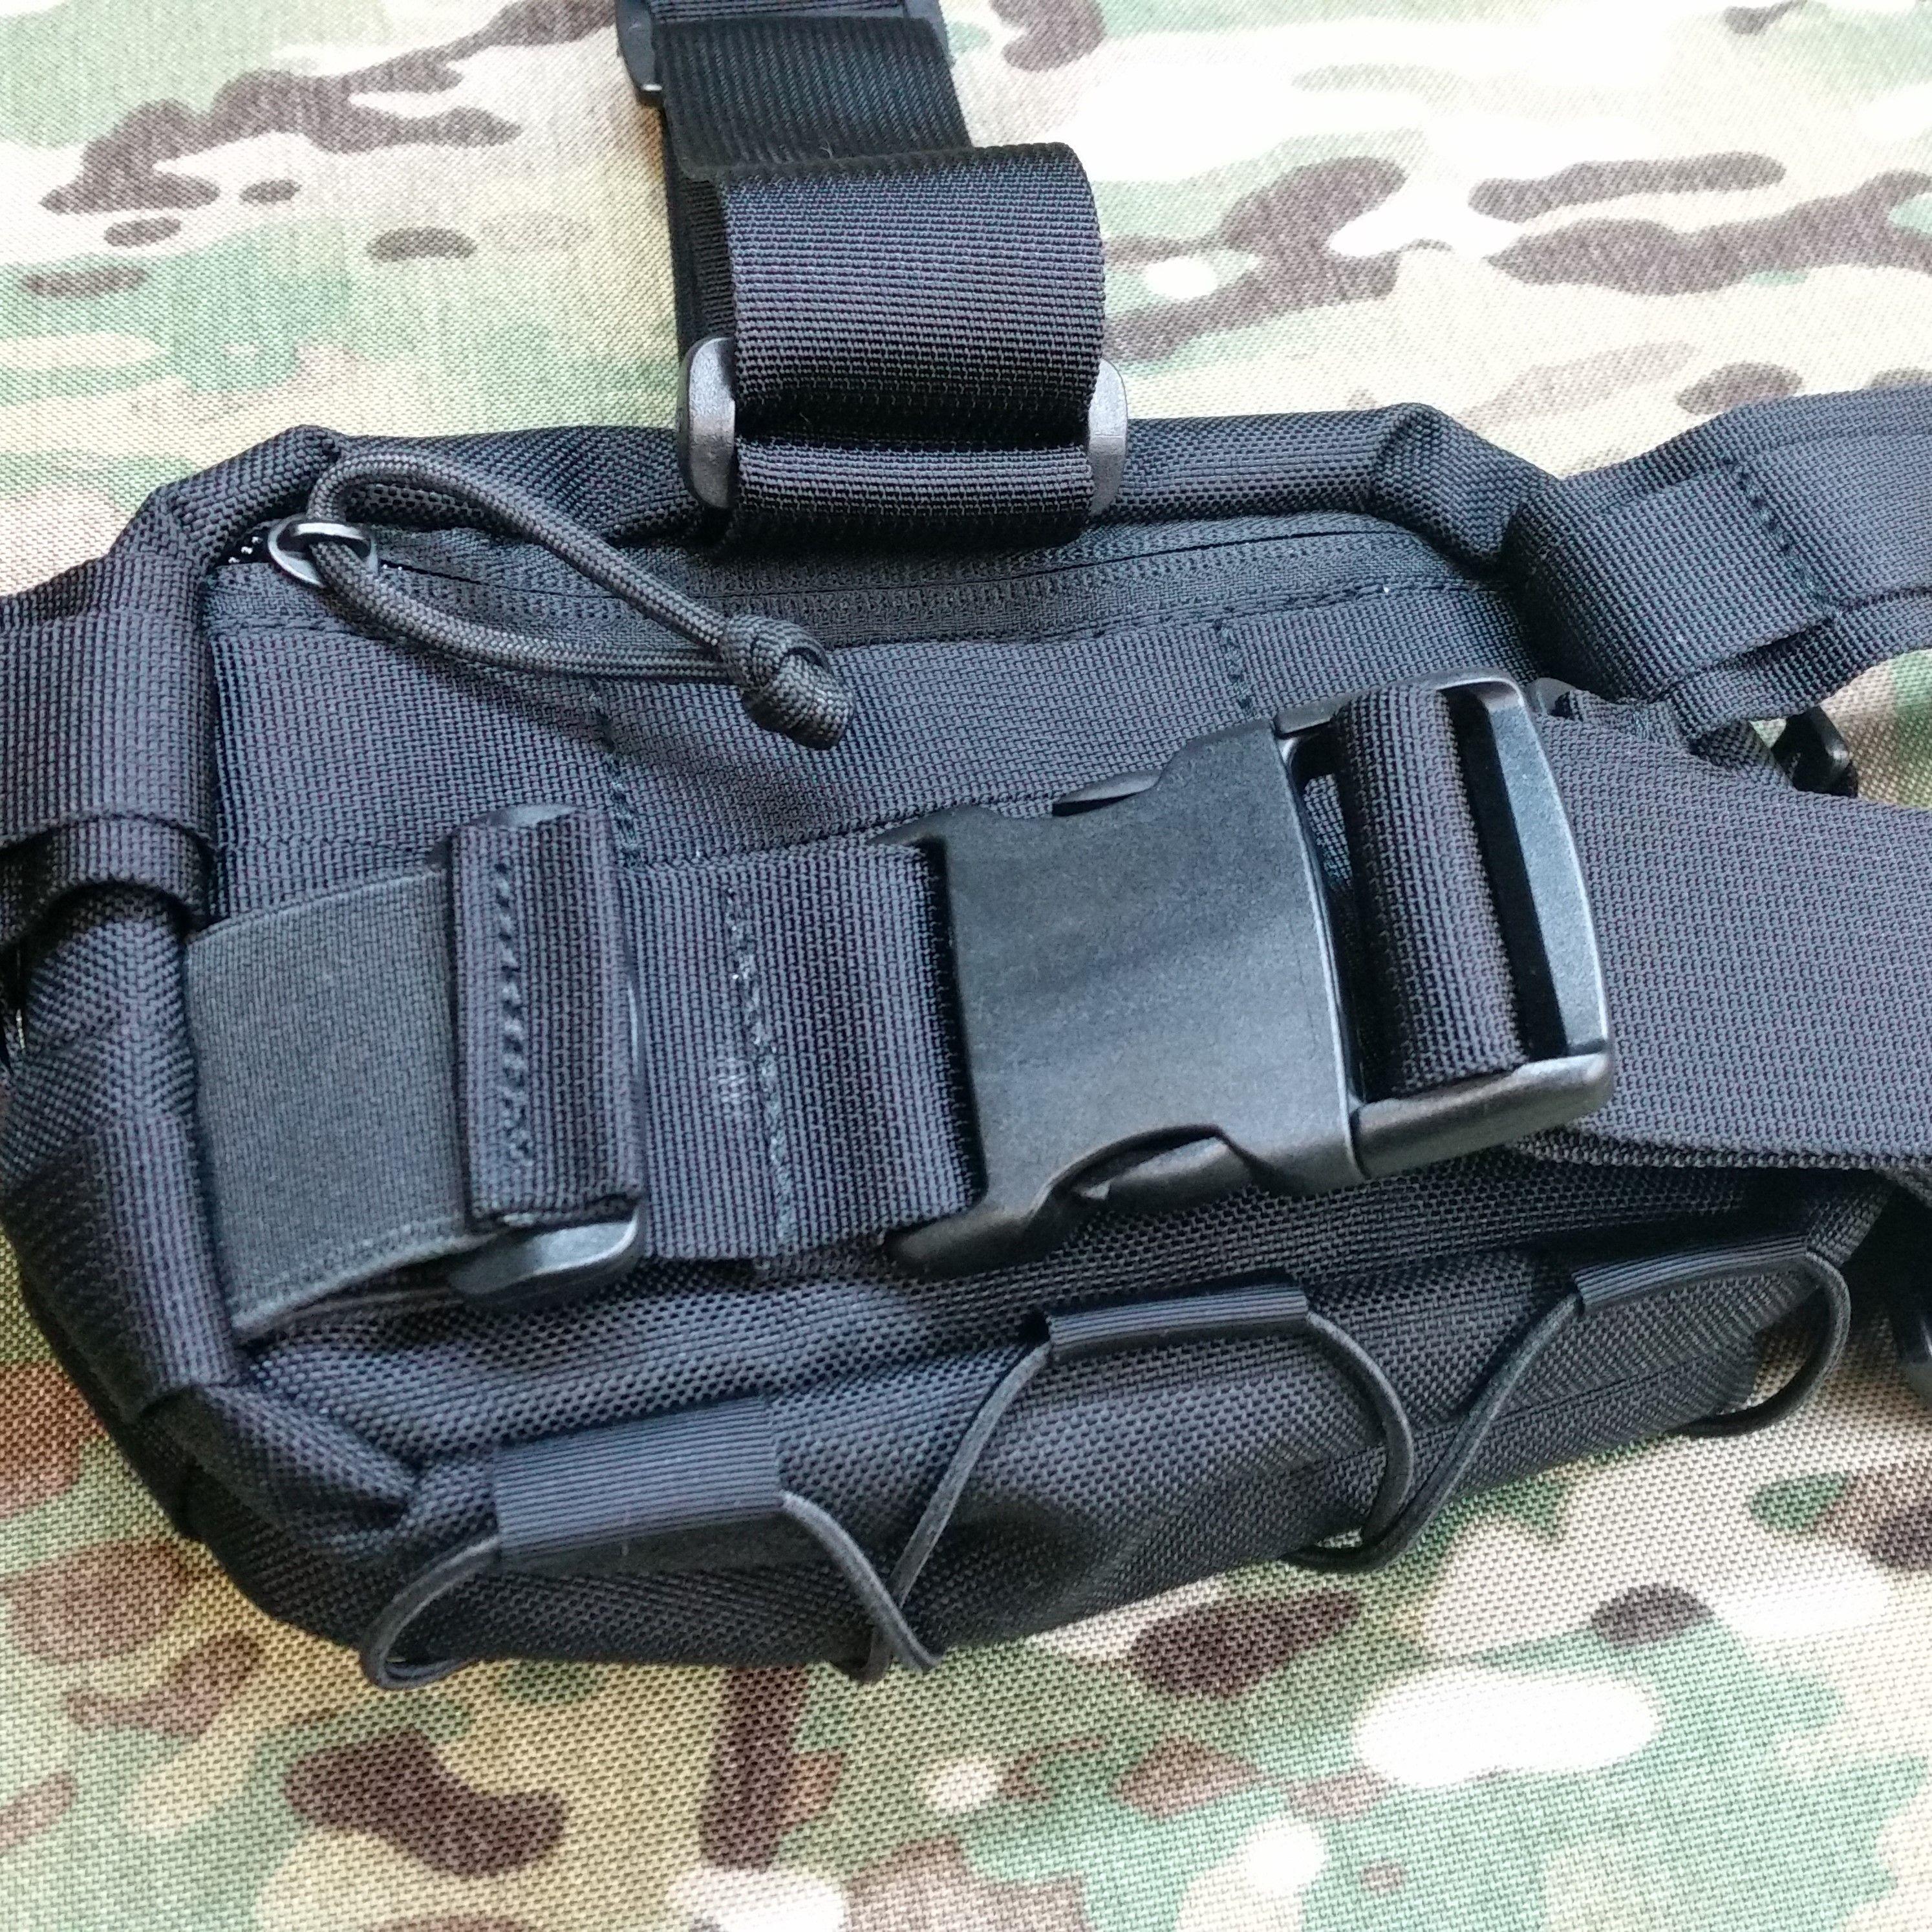 Detachable leg harness webbing system +25pln